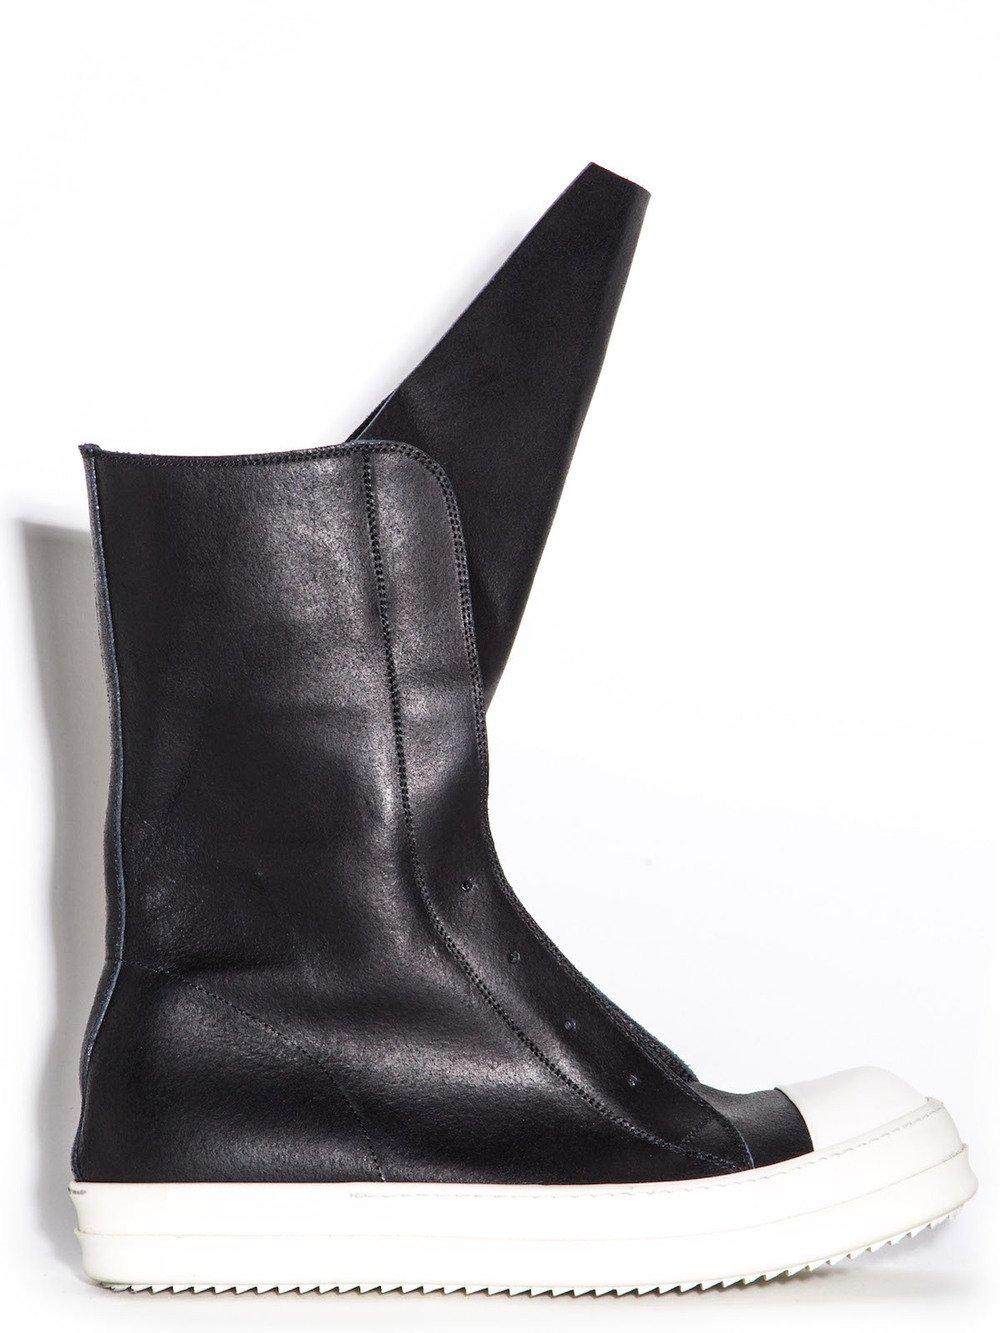 FOOTWEAR - Boots Rick Owens i11ha